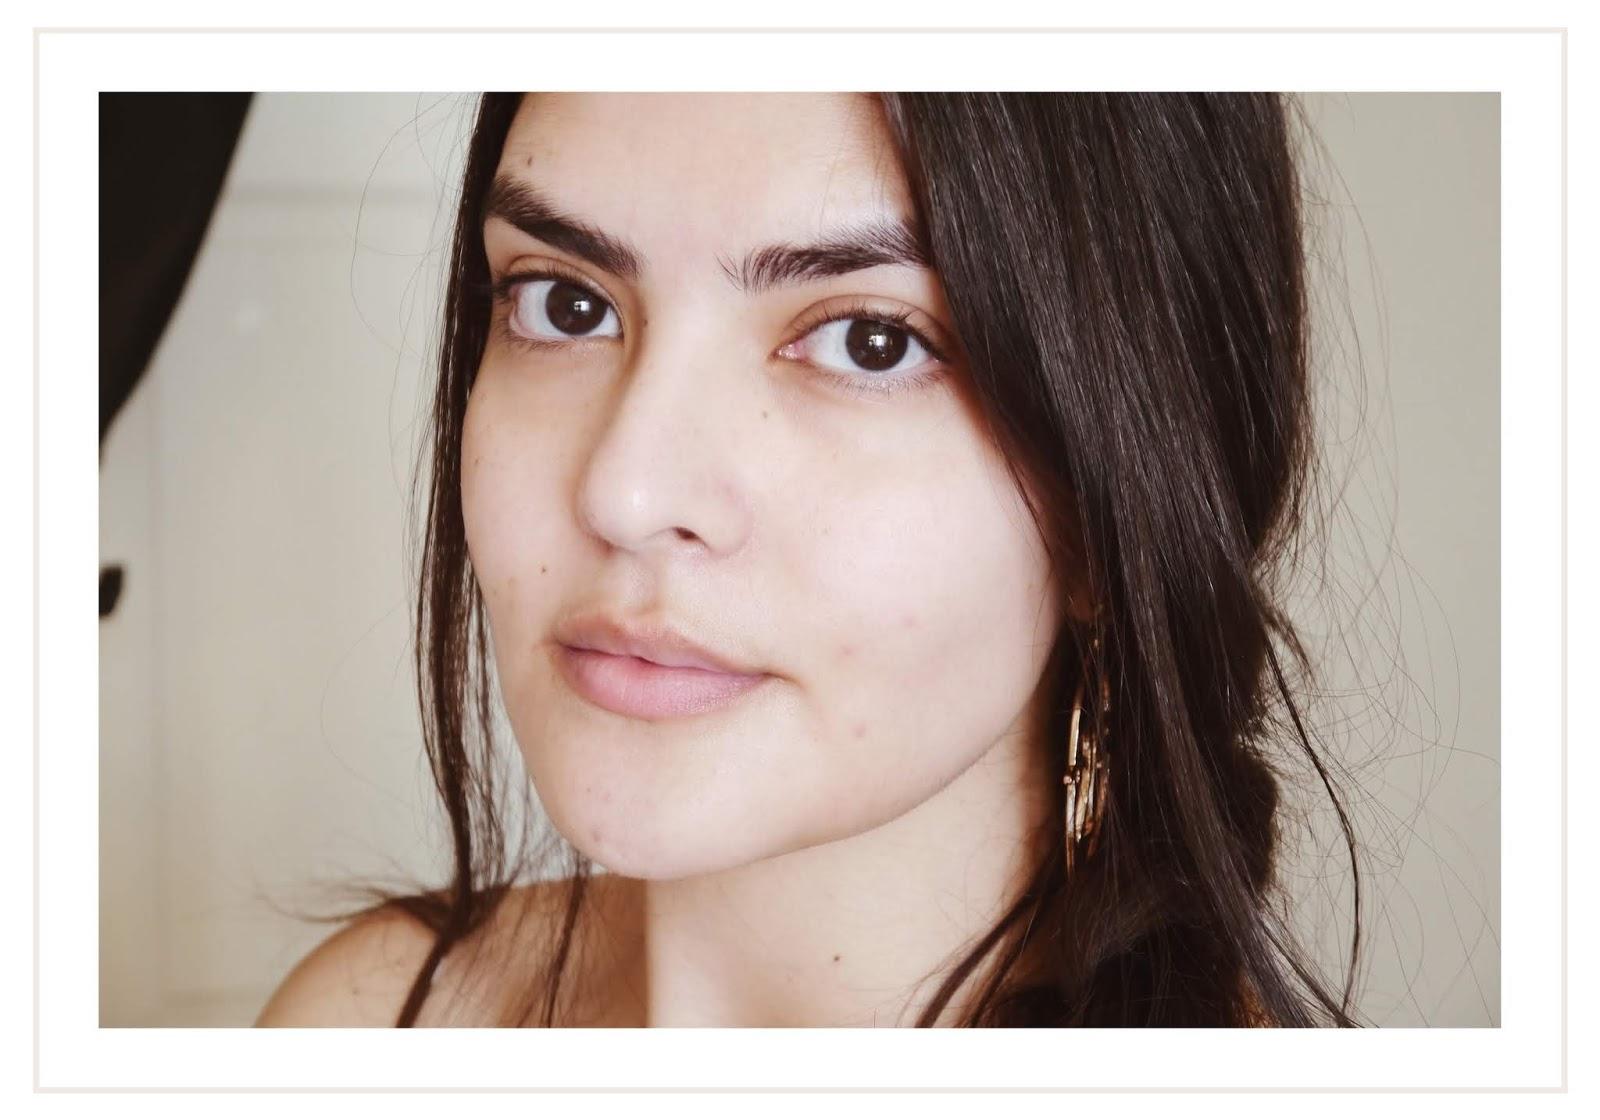 dior capture youth creme serum lift sculpt plump skincare beauty blogger mexicana belleza cuidado de piel mexico makeup 5